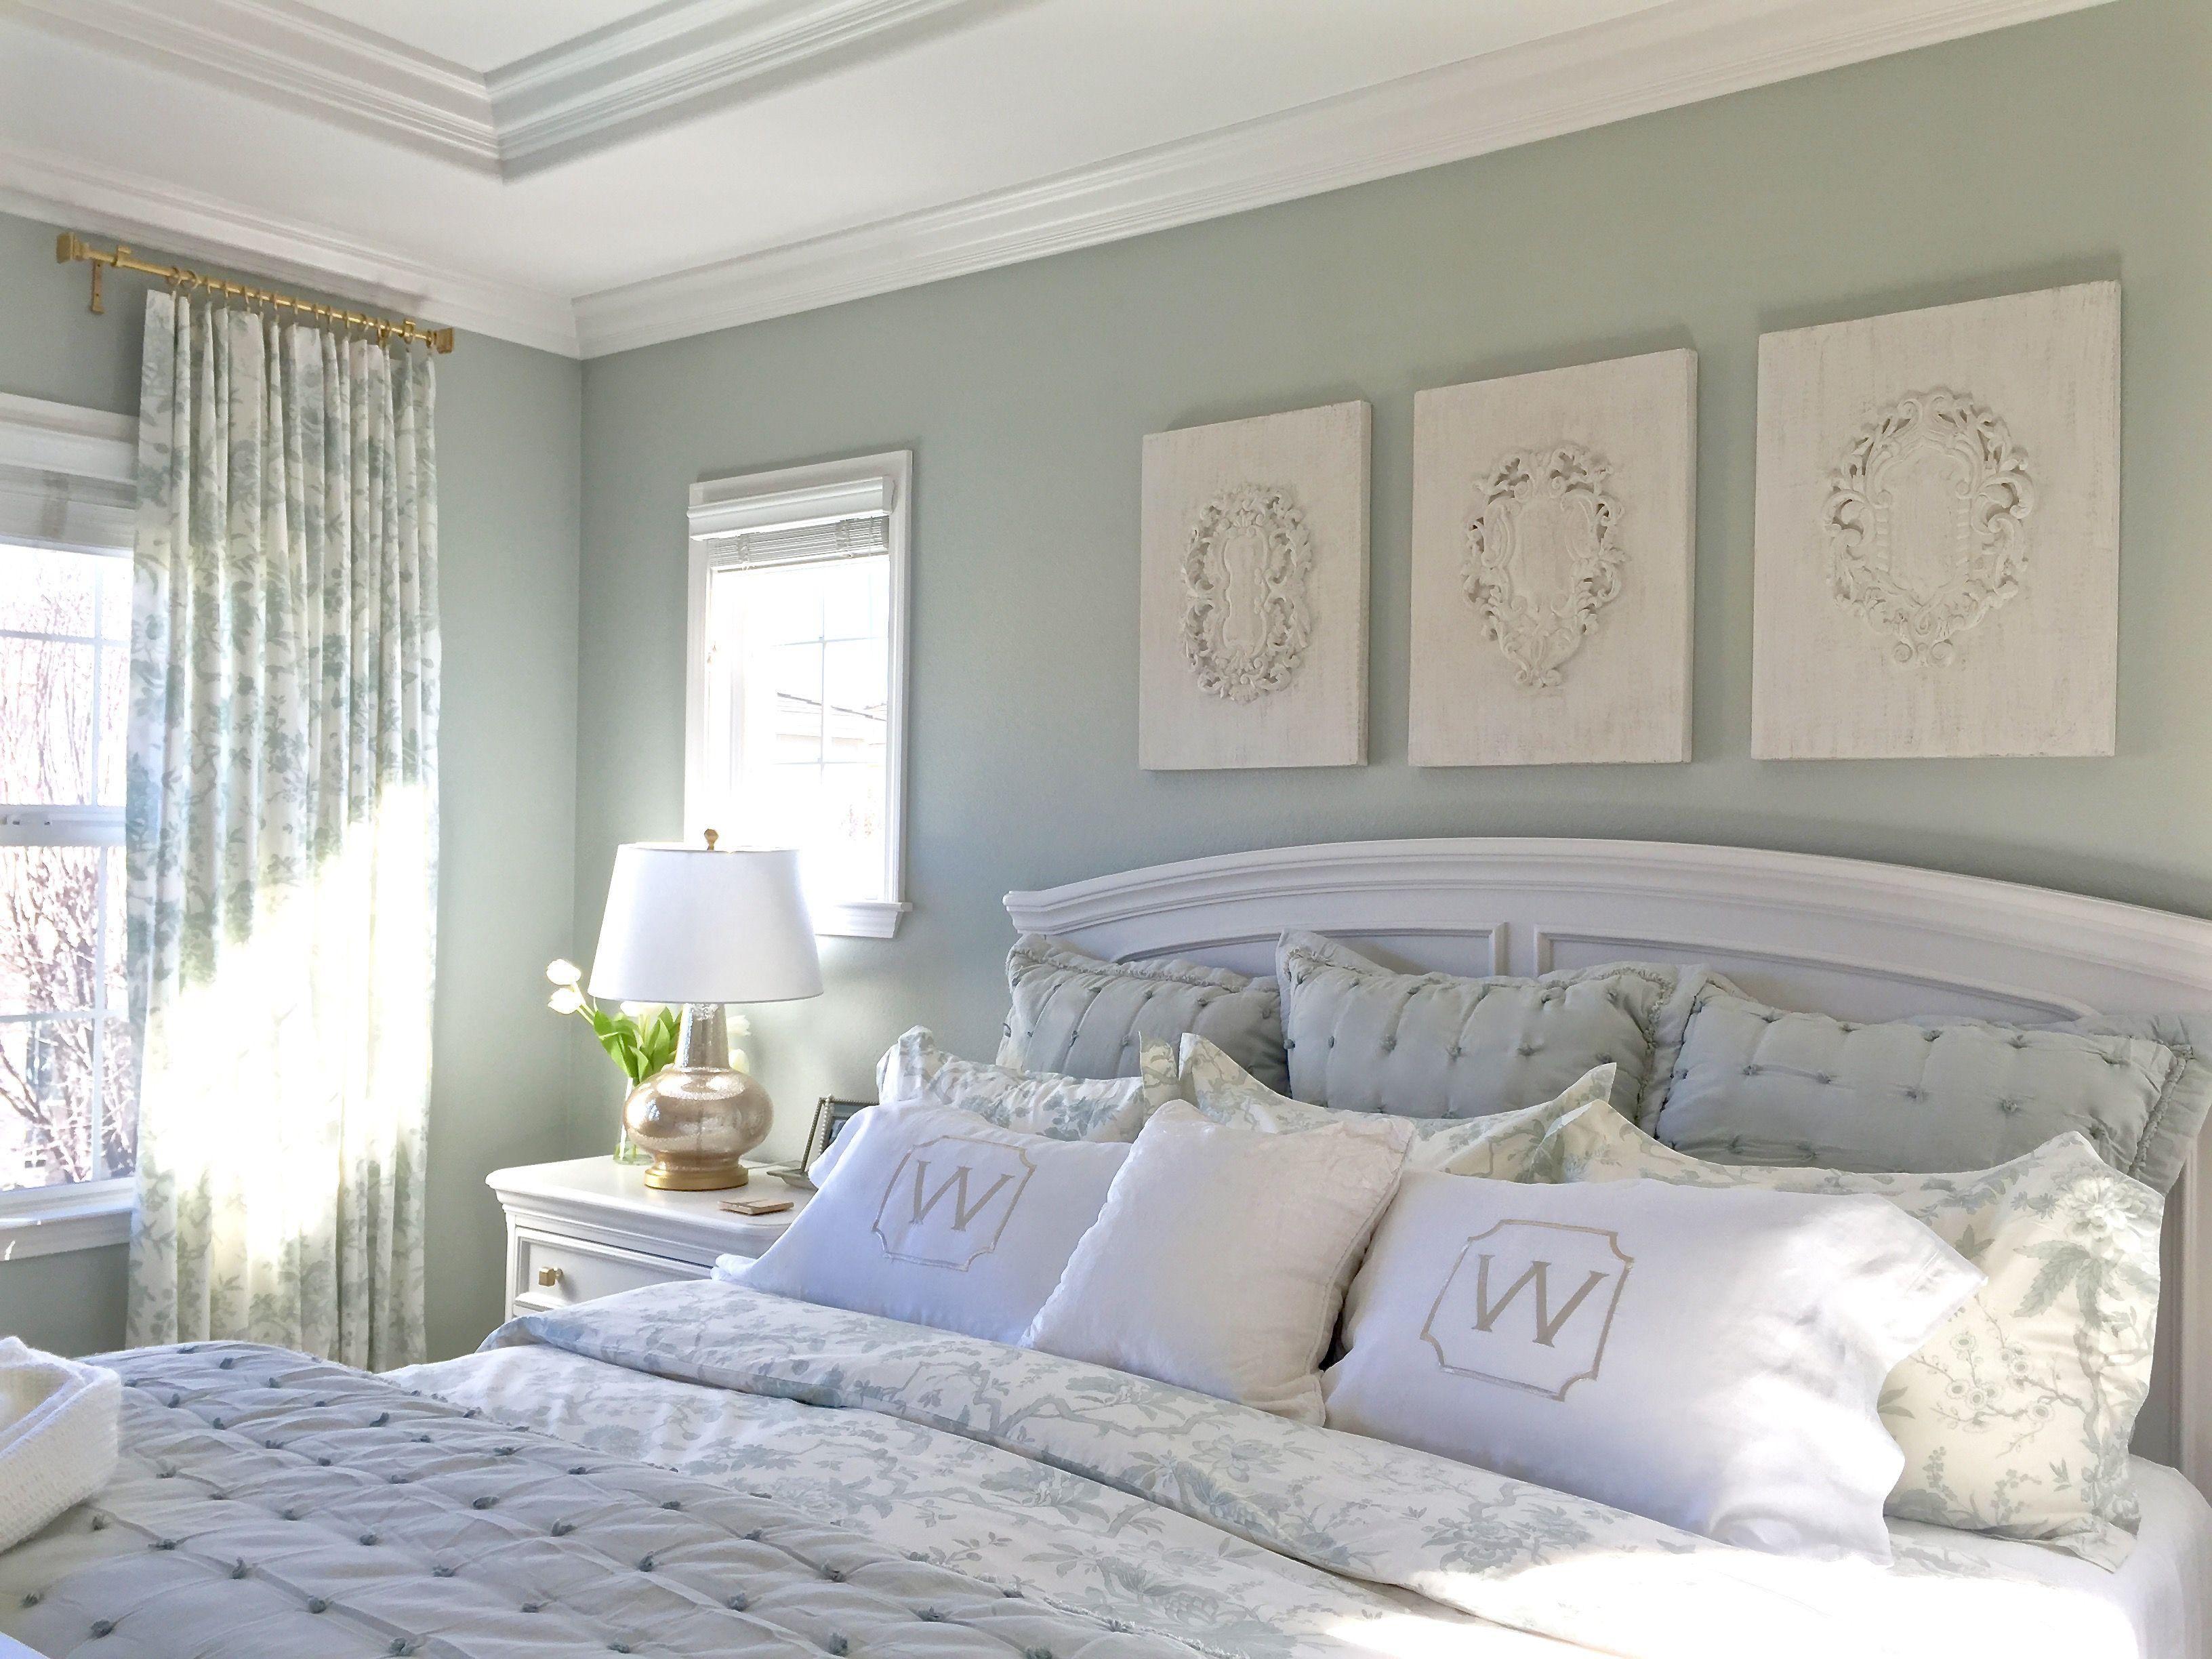 Best 25+ Ballard designs ideas on Pinterest | Living room ...